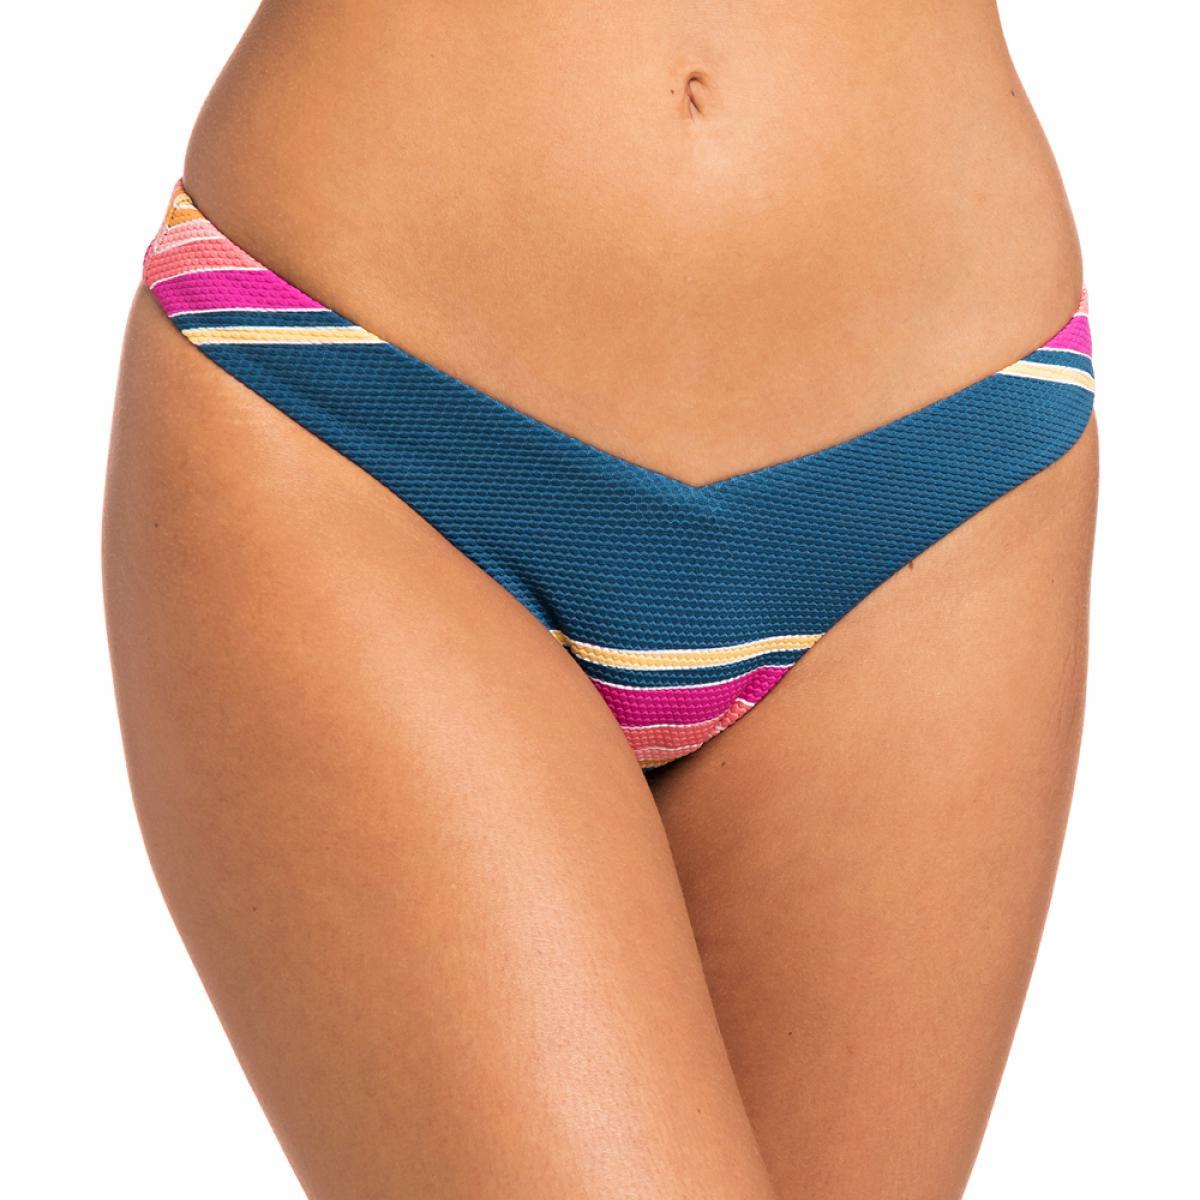 Promo : Culotte de bain brésilienne multicolore